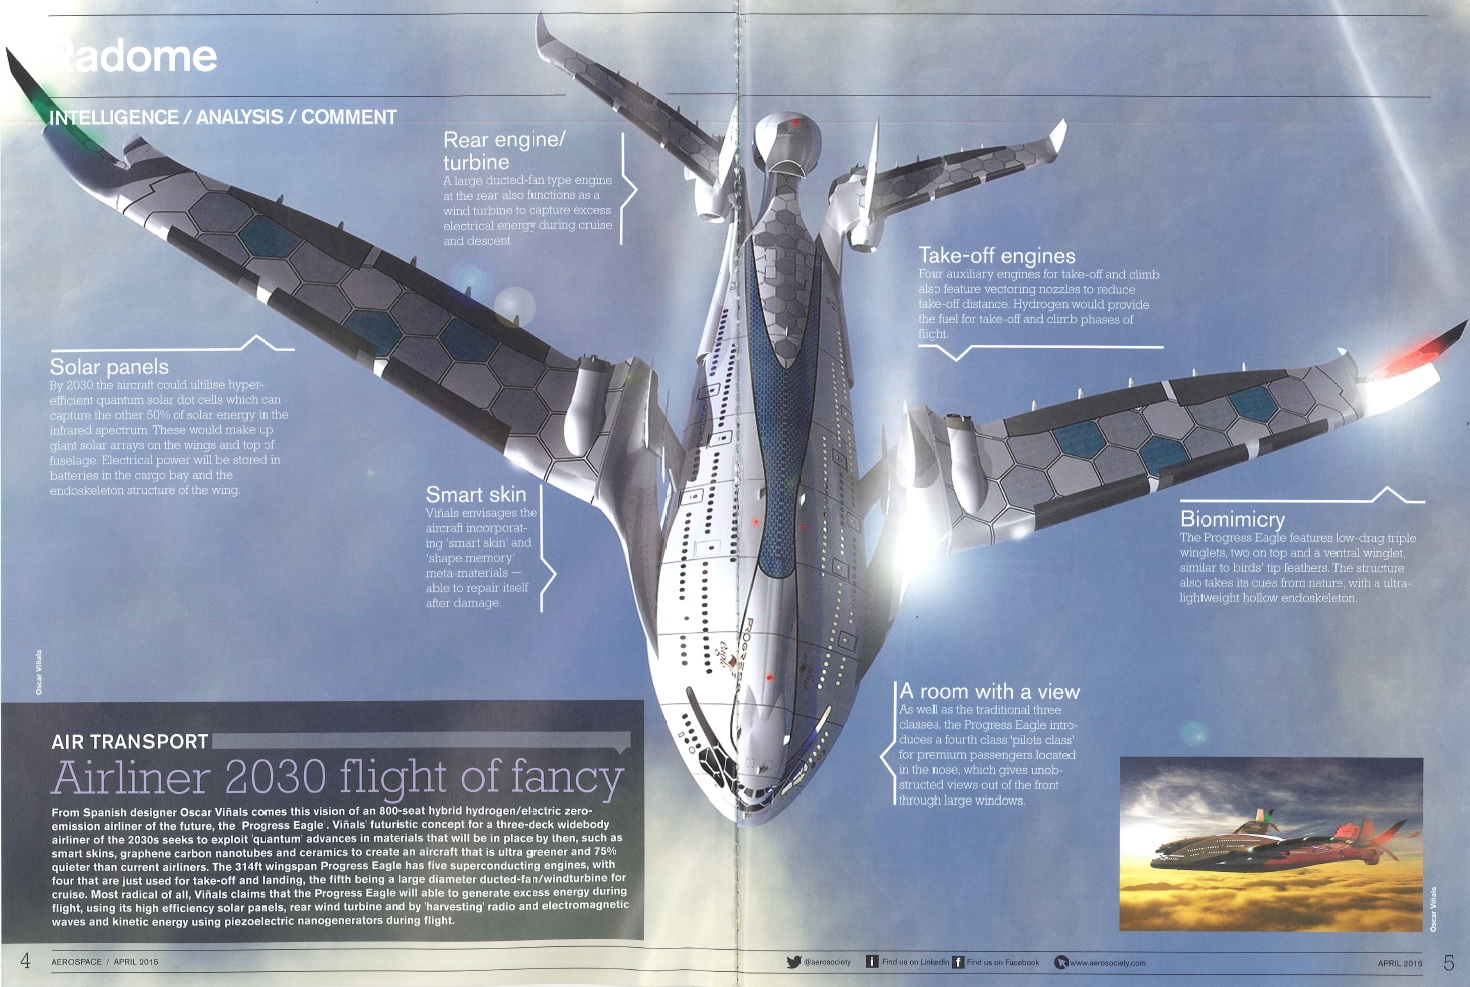 Source: AeroSpace Magazine (April 2015)